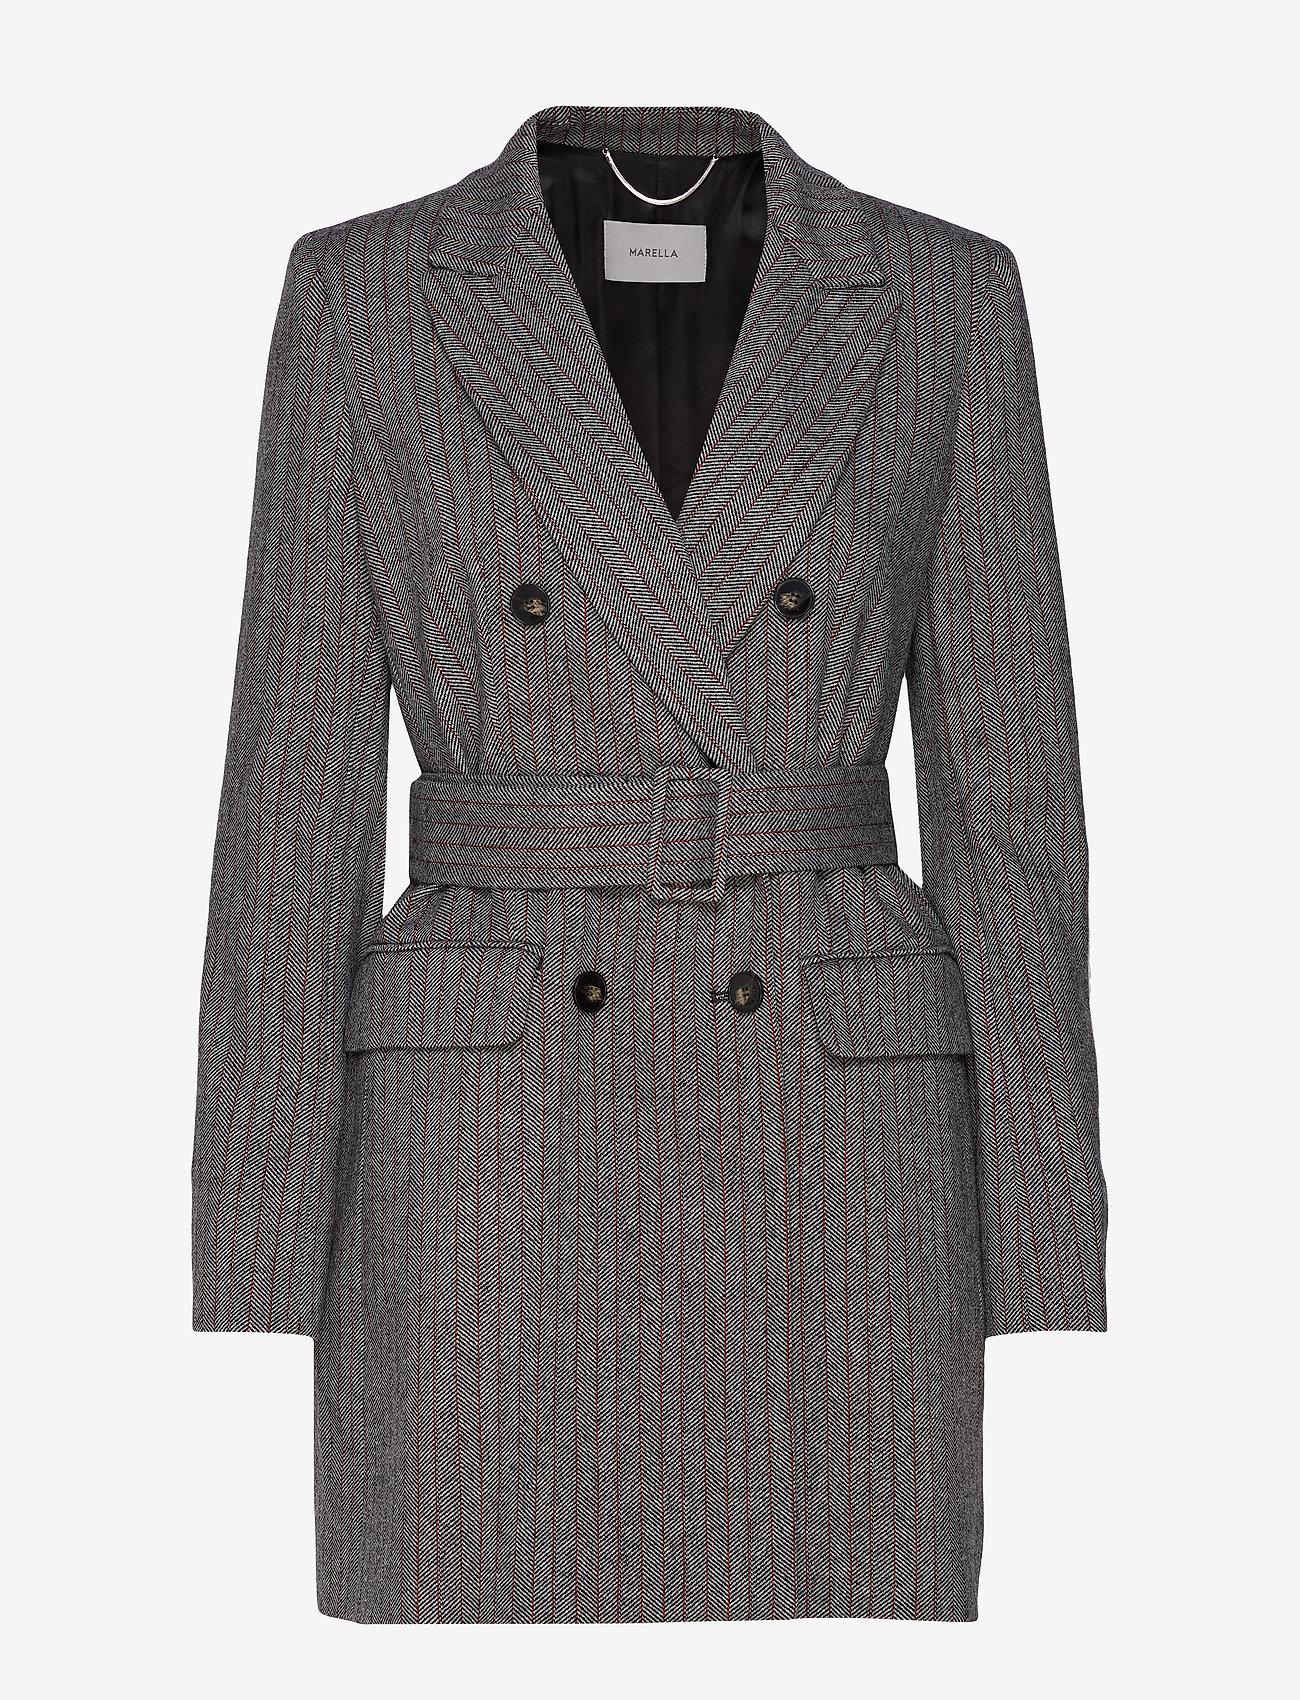 Marella - TIFFANY - wełniane kurtki - grey pin-strip. herringbone - 0